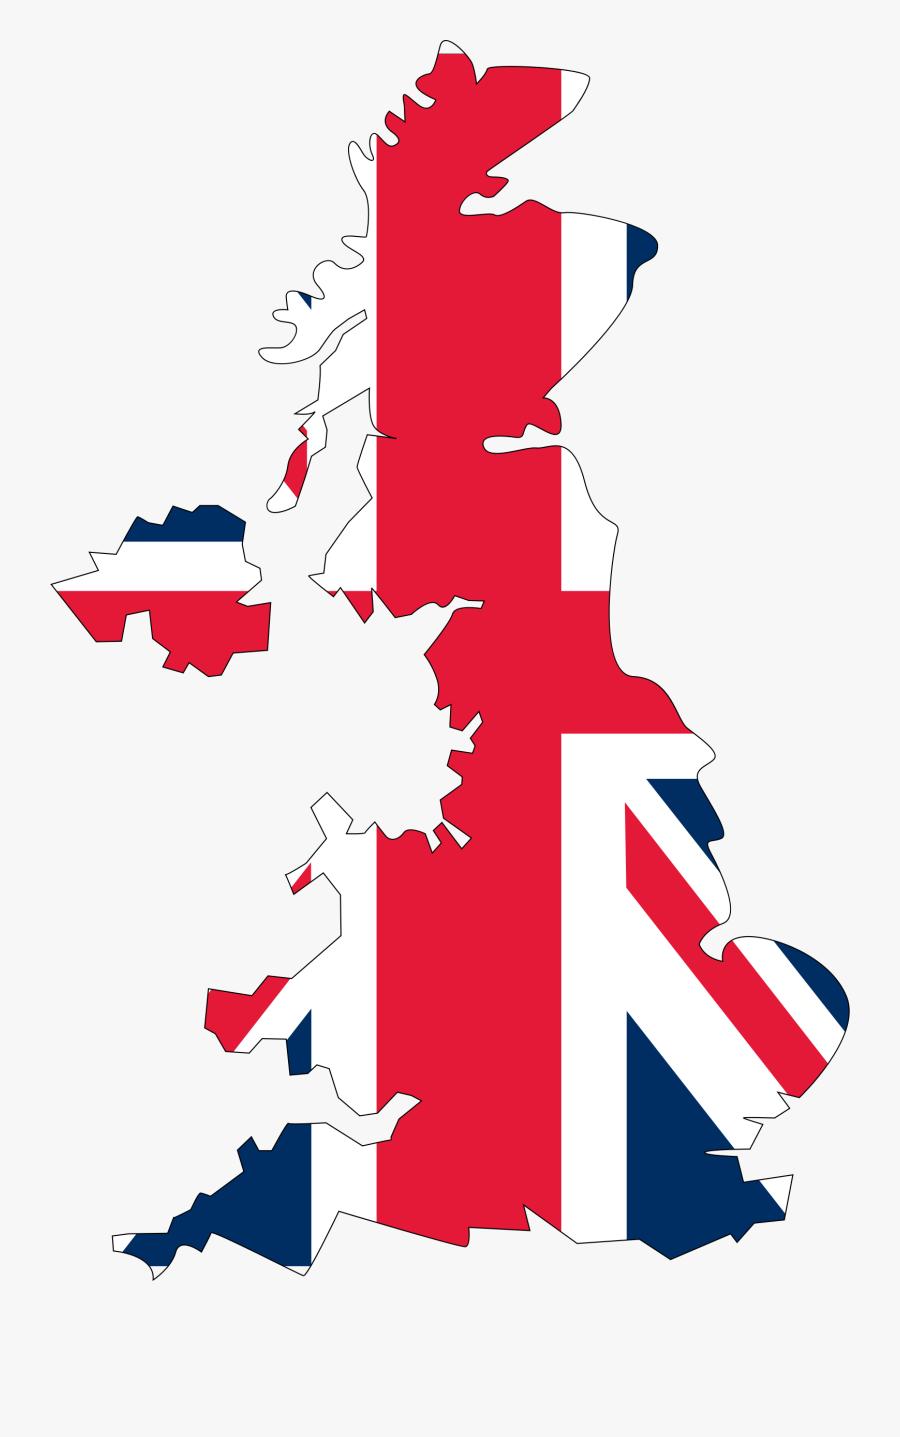 Transparent Map Clipart Png - United Kingdom Map Svg, Transparent Clipart